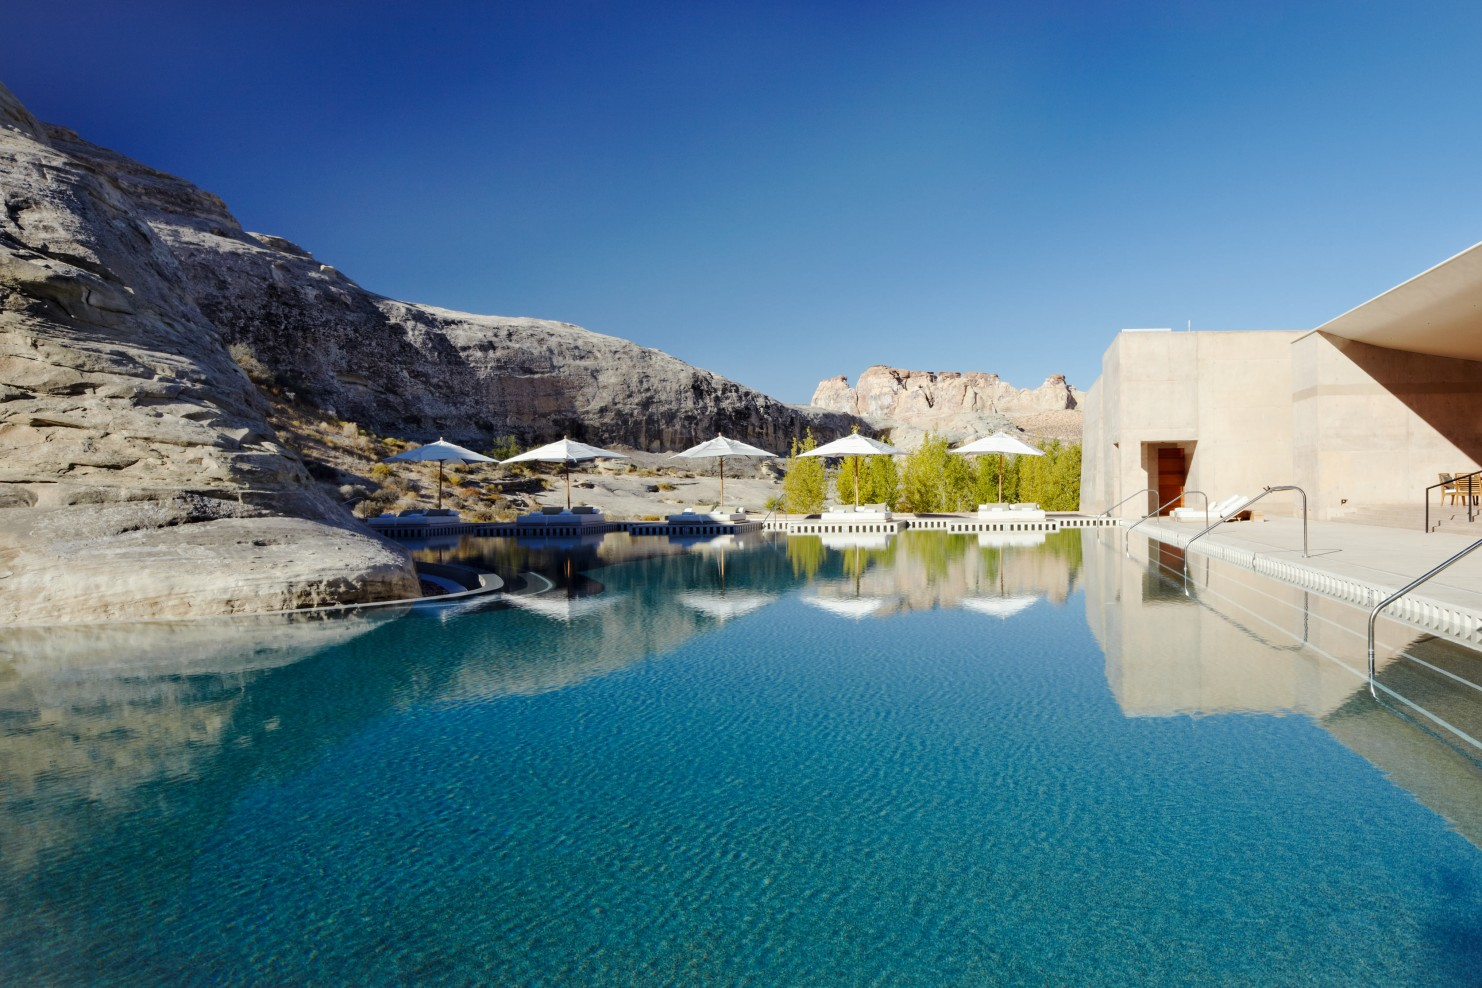 Amangiri hotel | Lone Rock, Lake Powell | Utah | Smith Hotels